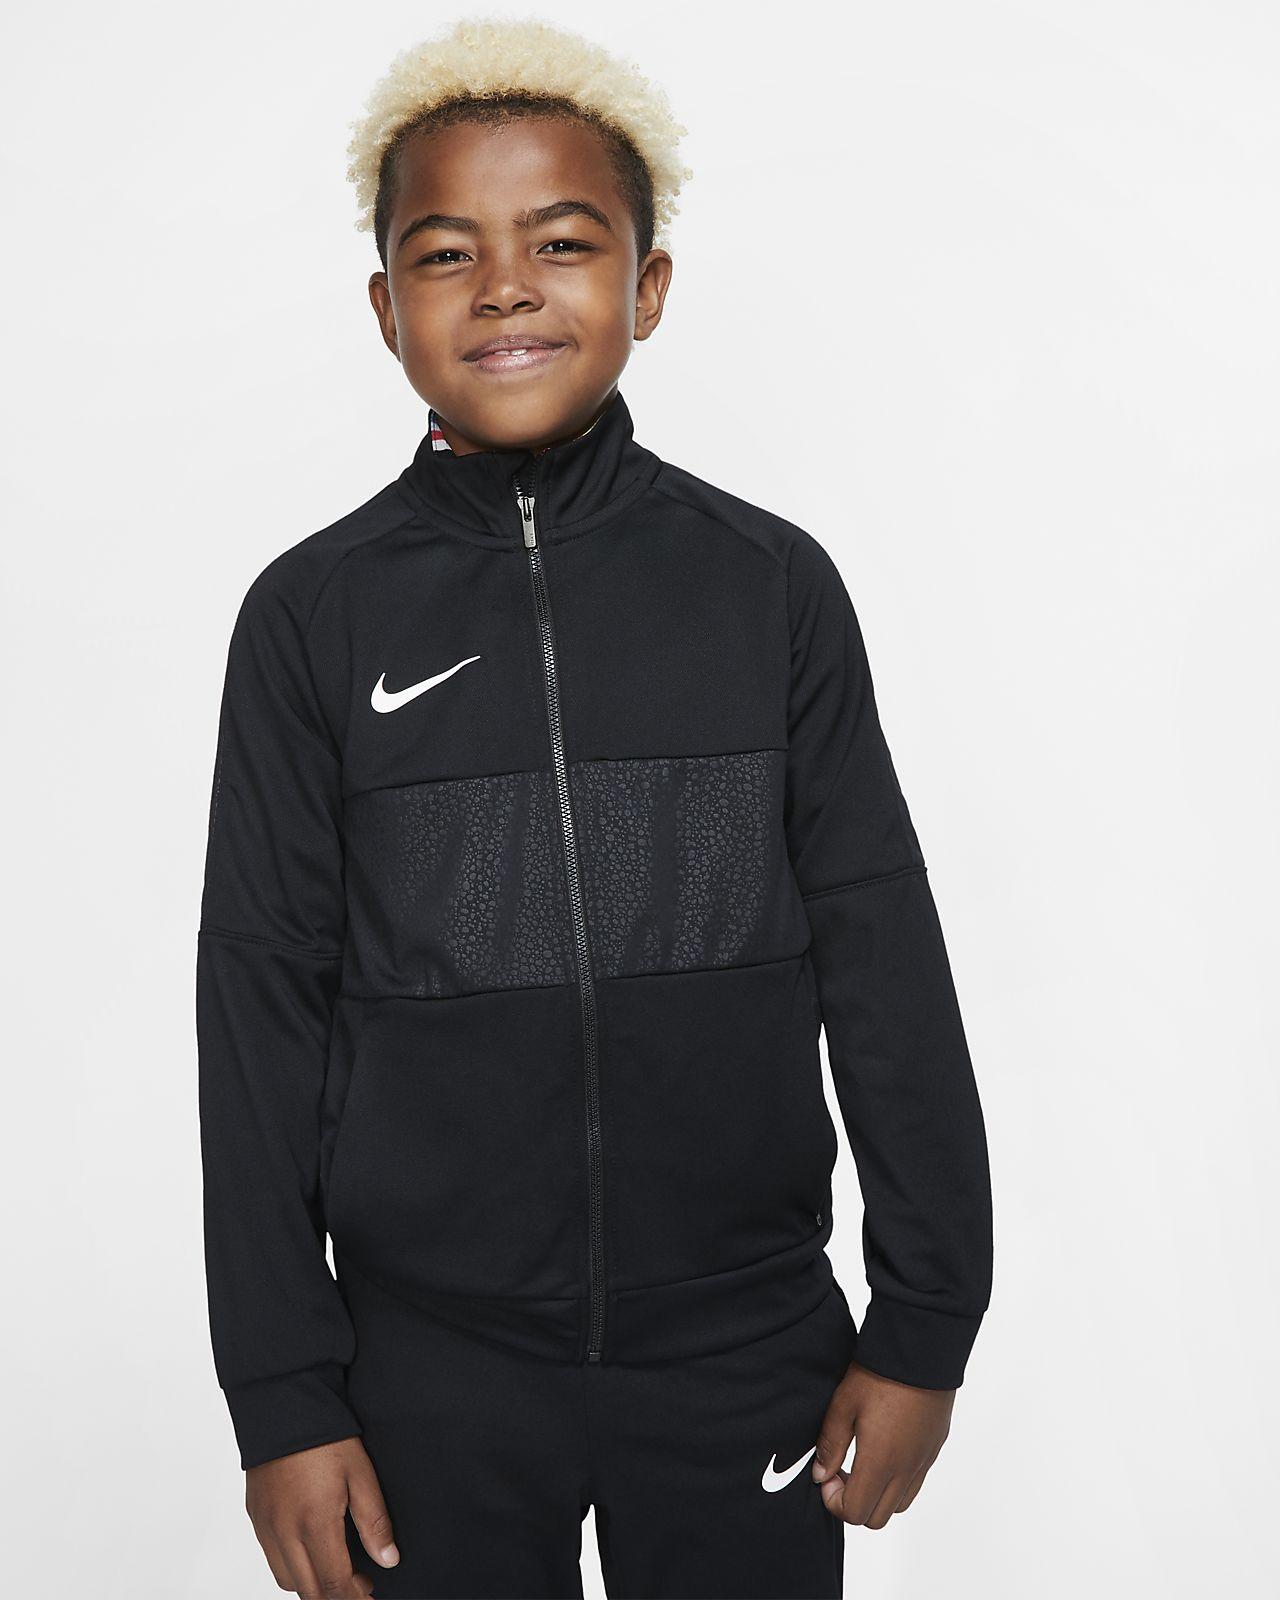 Nike Dri-FIT Mercurial耐克刺客系列大童(男孩)足球夹克